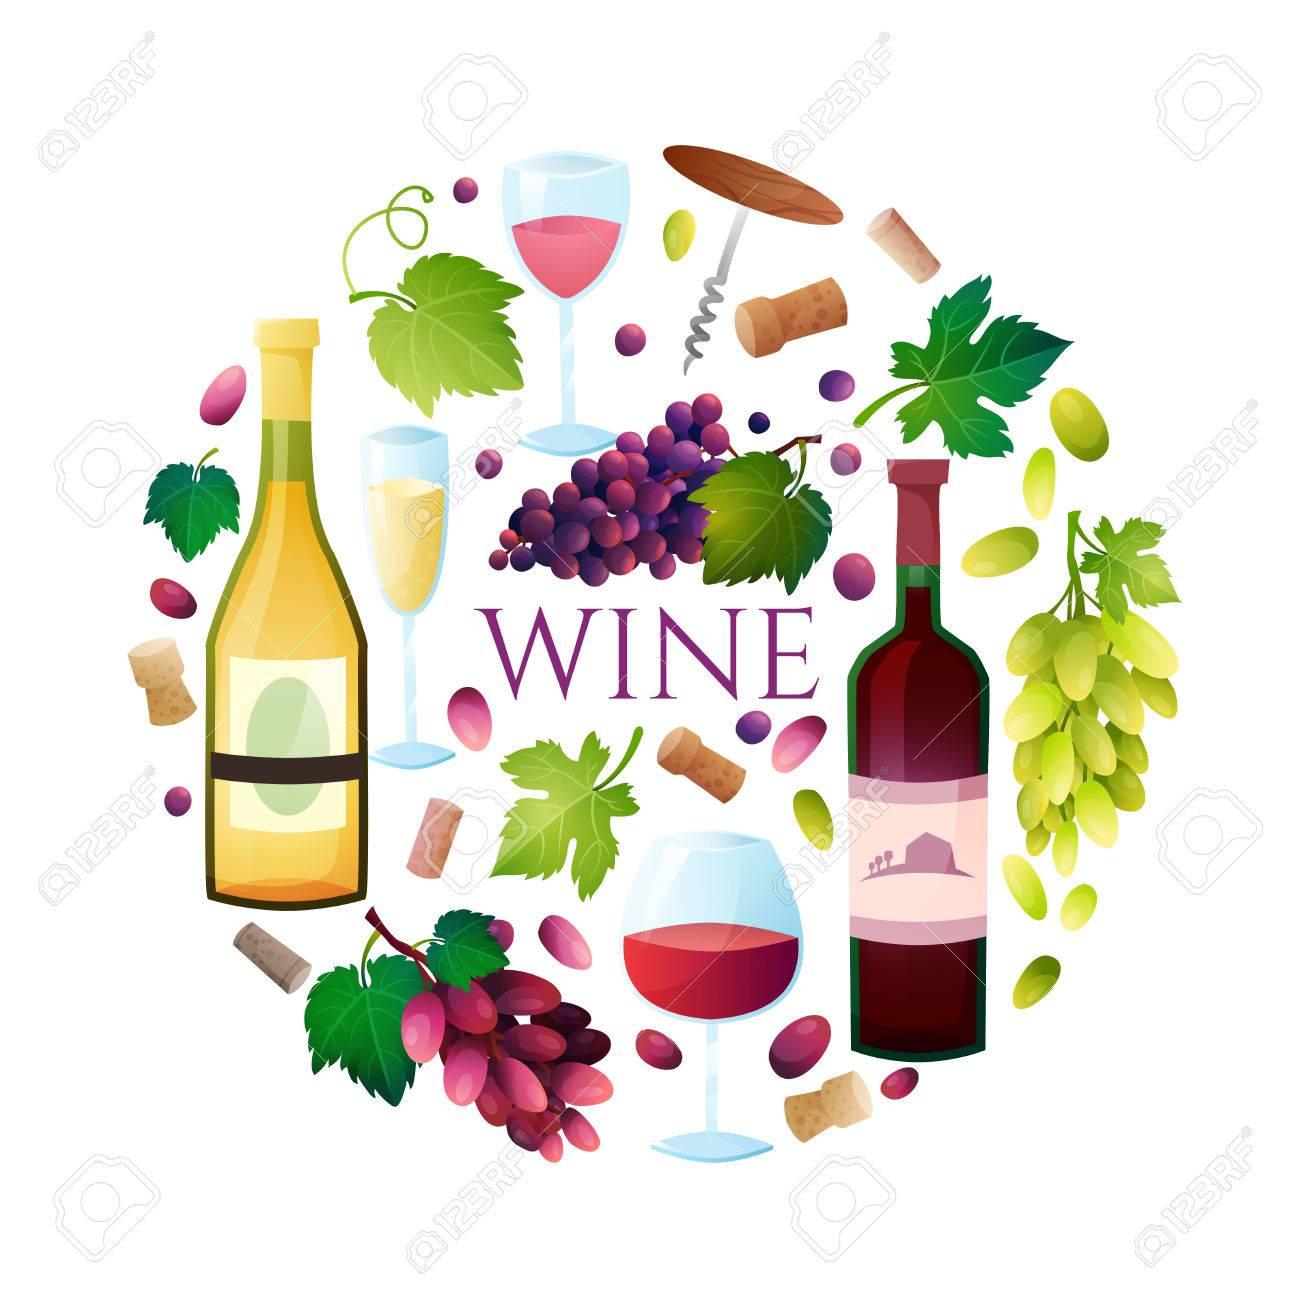 Illustration OF wine barrel, wine glass, grapes, grape twig.